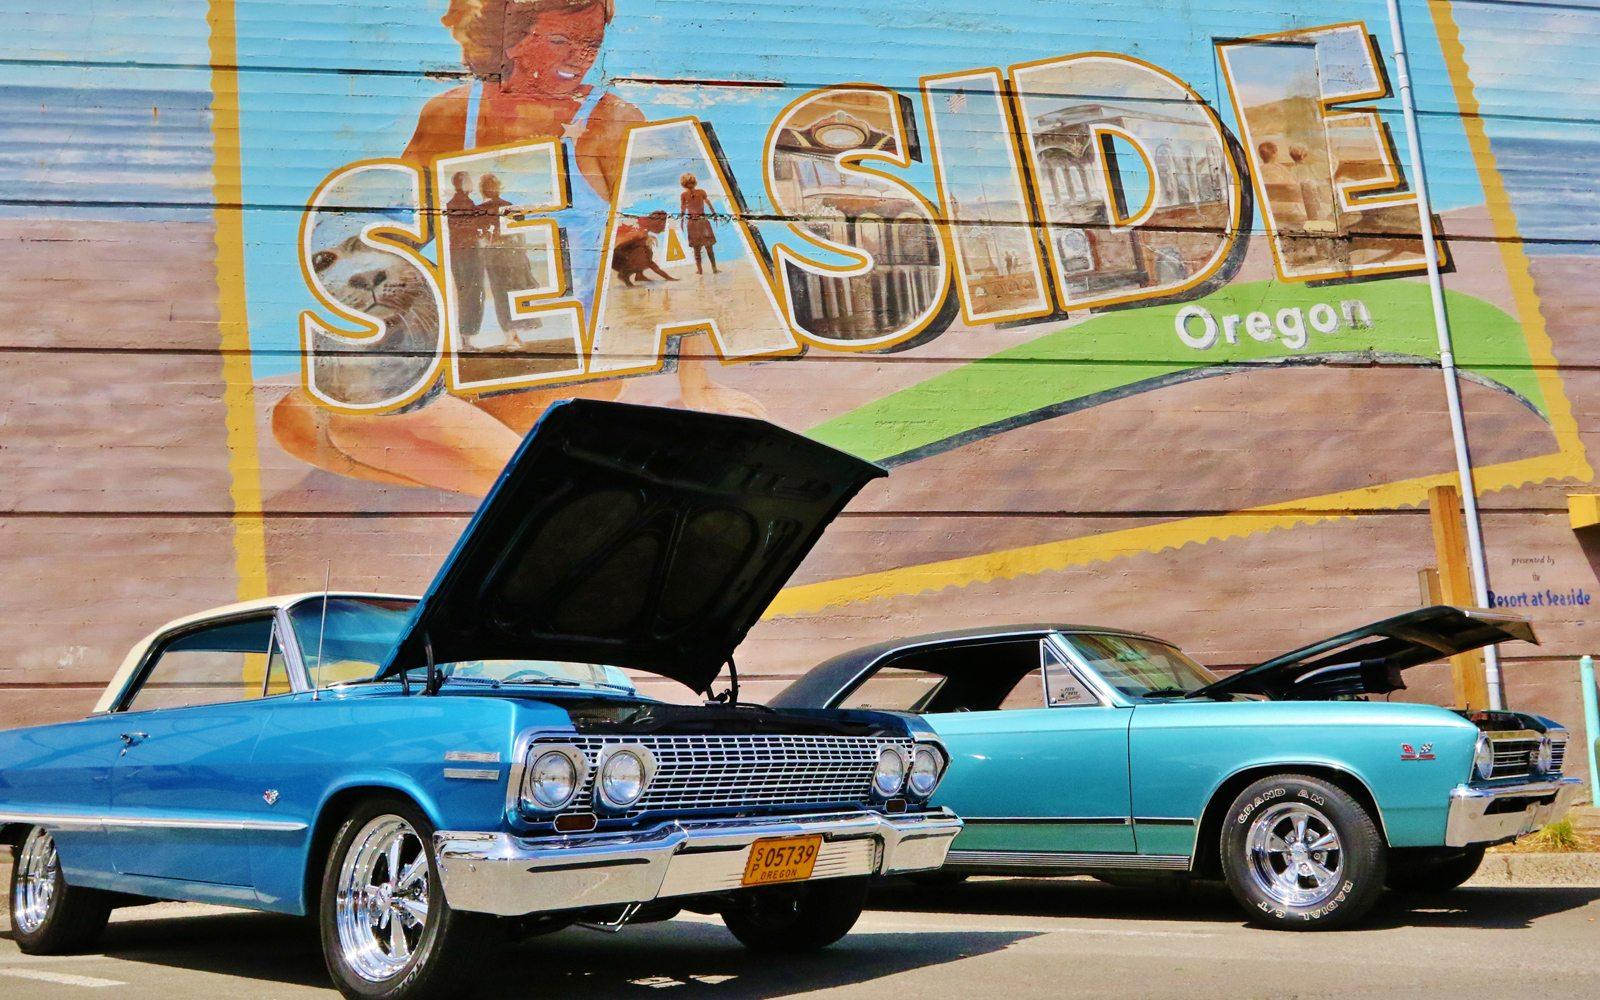 Hot Summer Car Shows help usher in the summer season in Seaside.